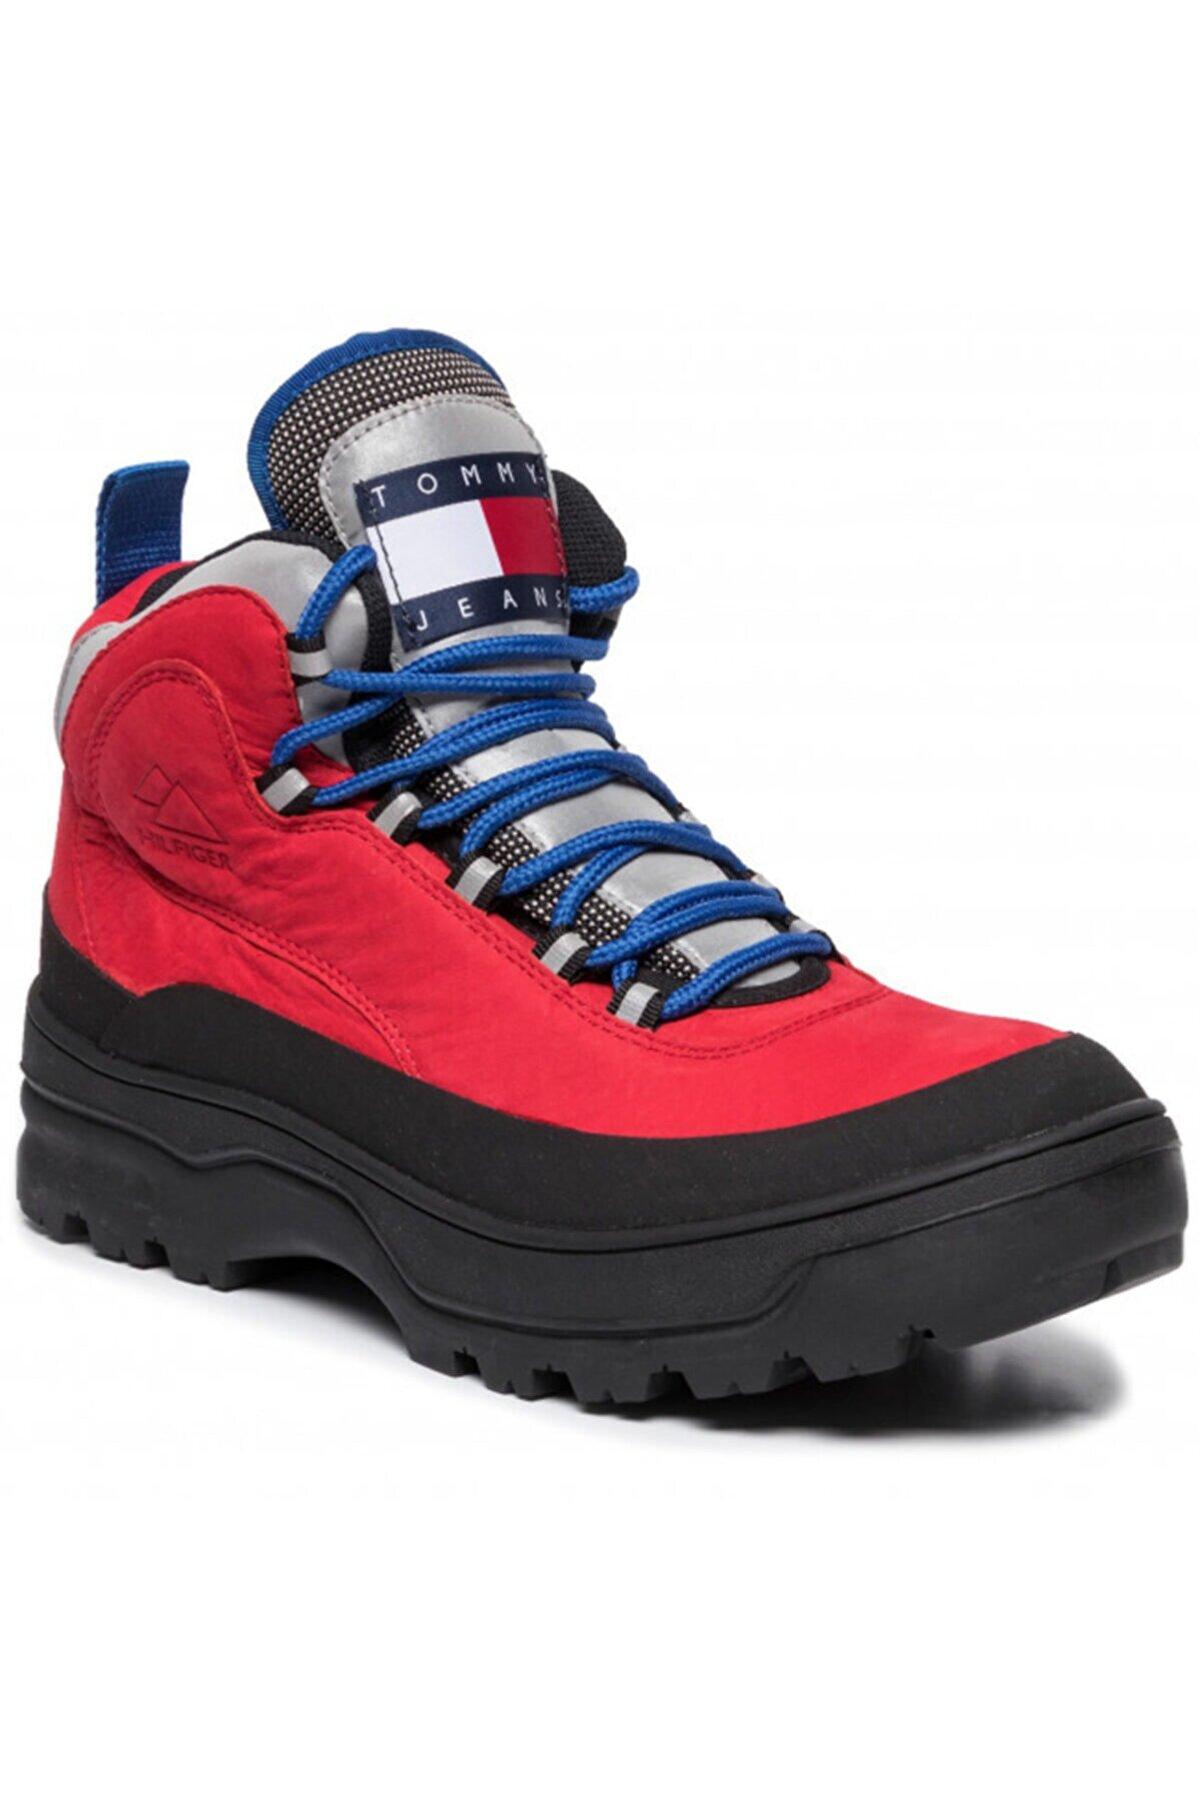 Tommy Hilfiger Hilfiger Expedition Mens Boot